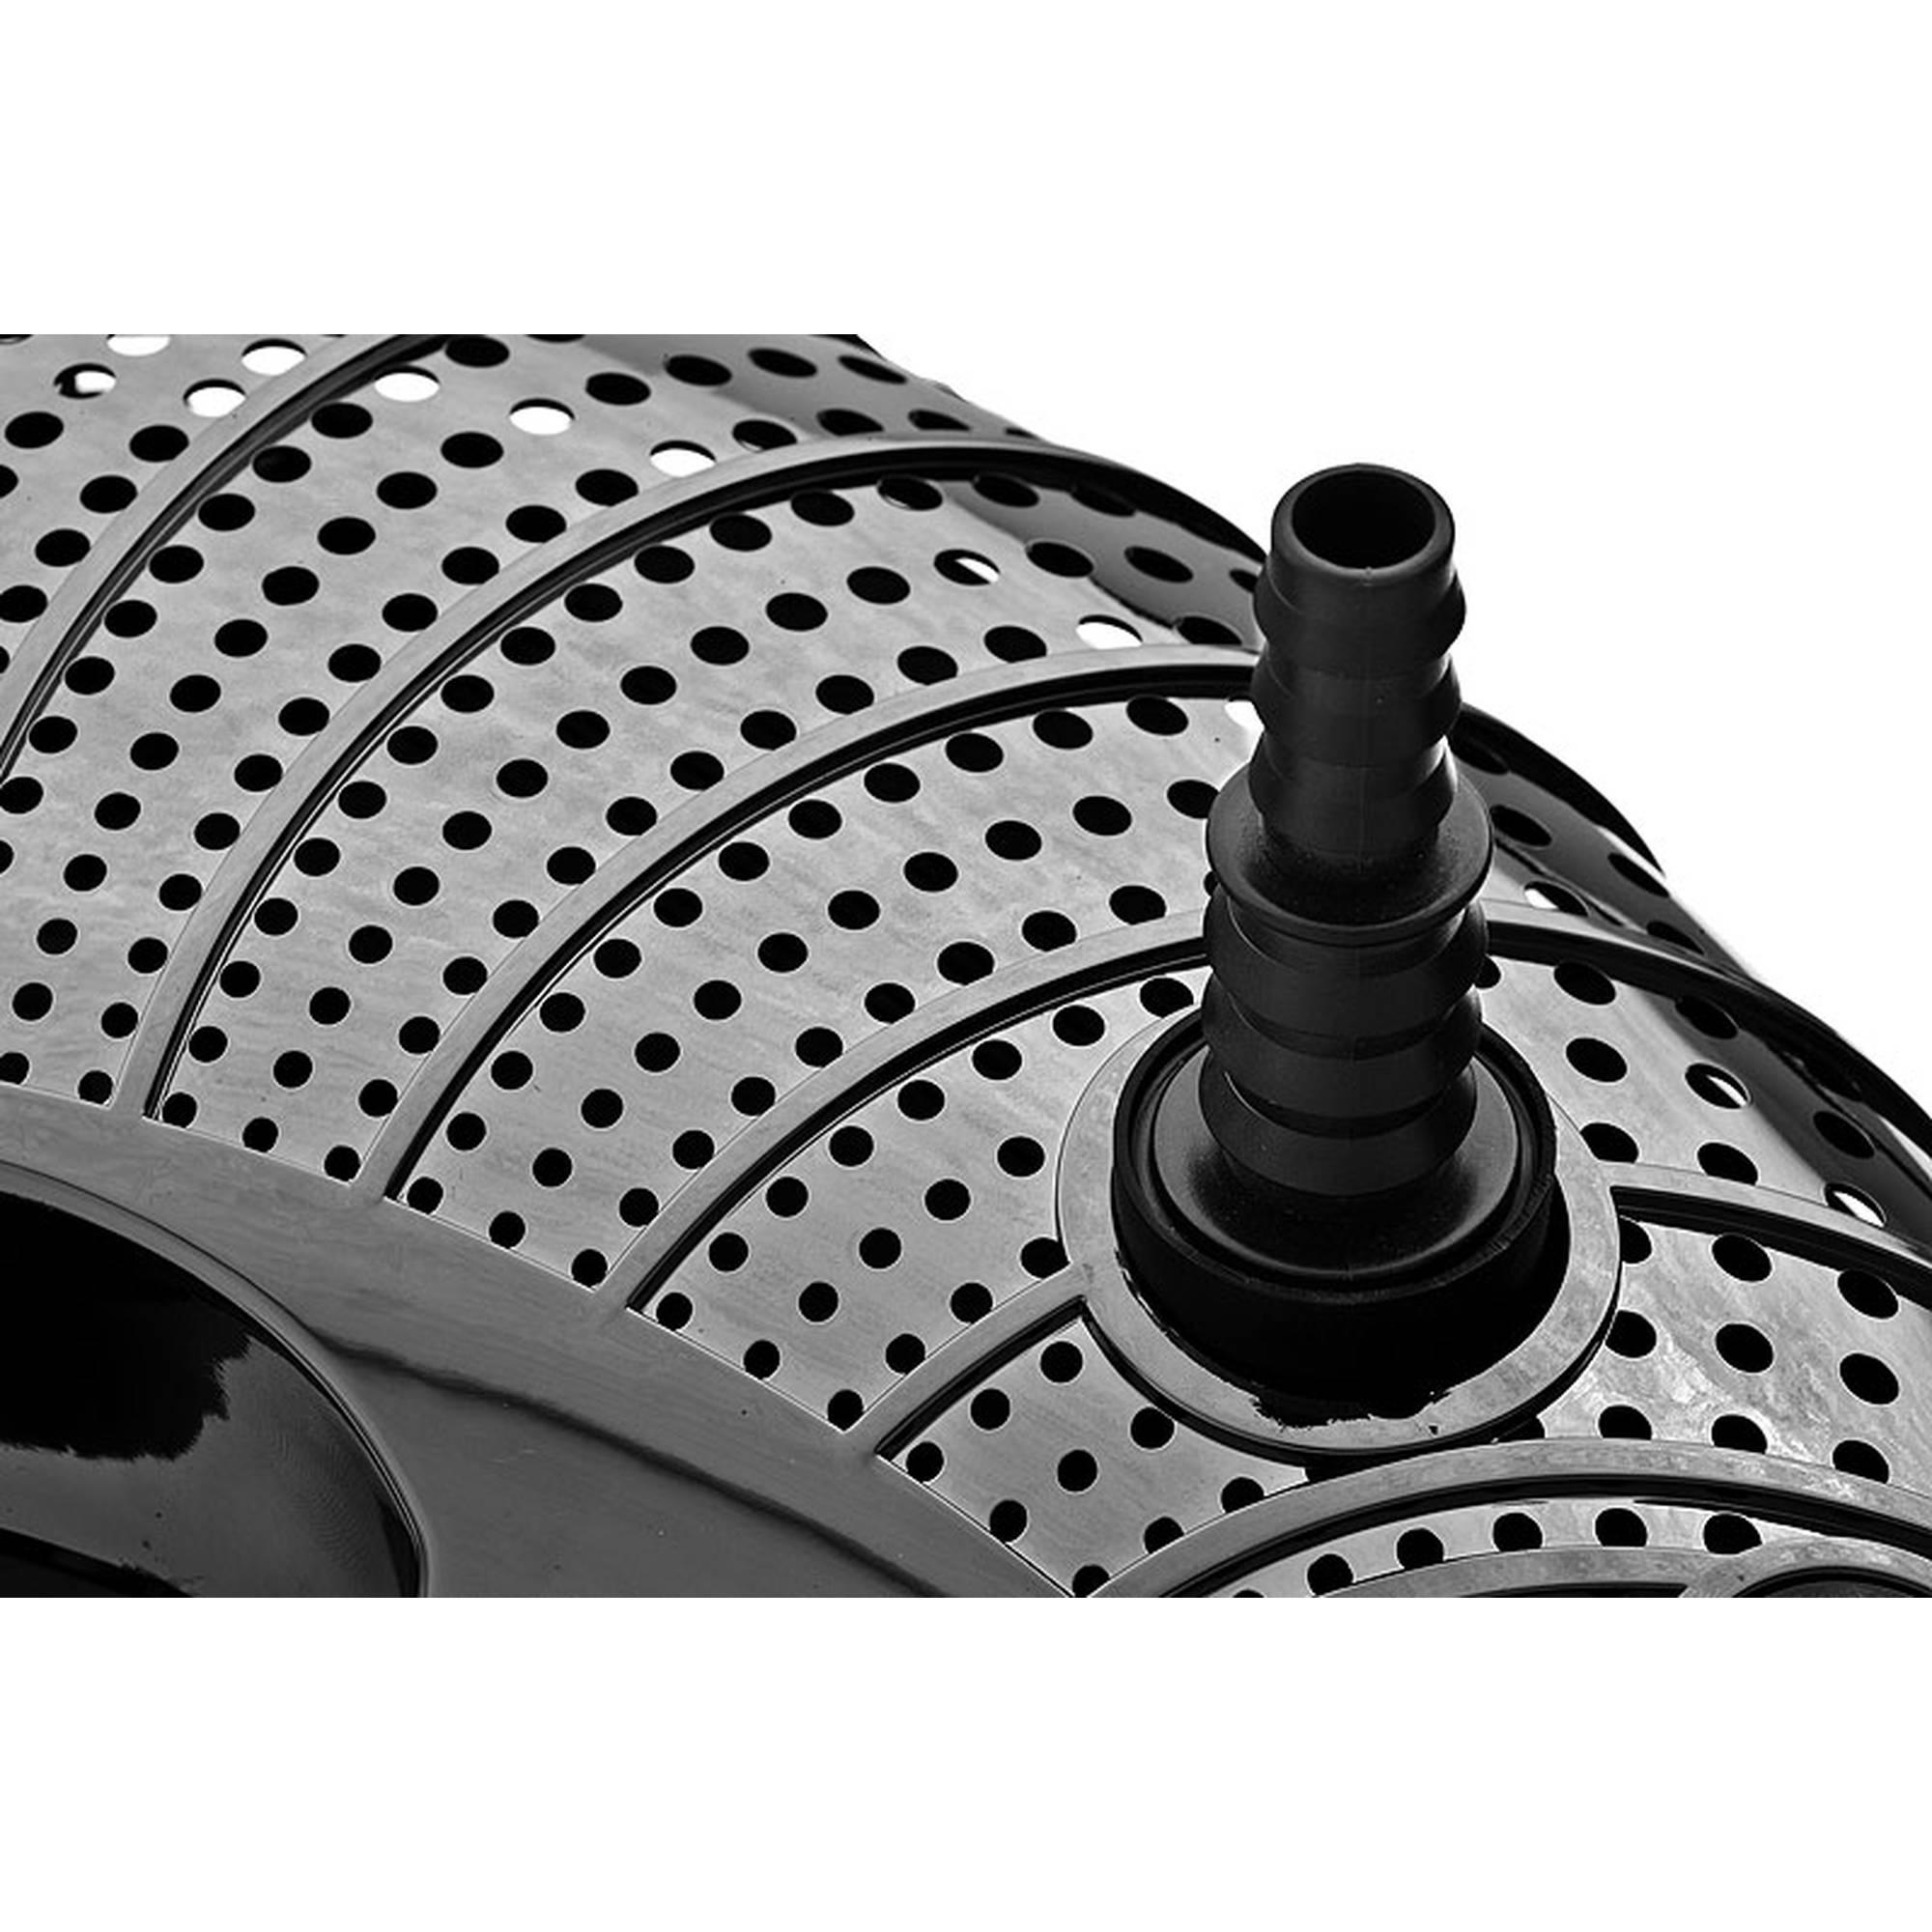 Filter- und Bachlaufpumpe Aqua Craft Premium Eco P2100E von Heissner